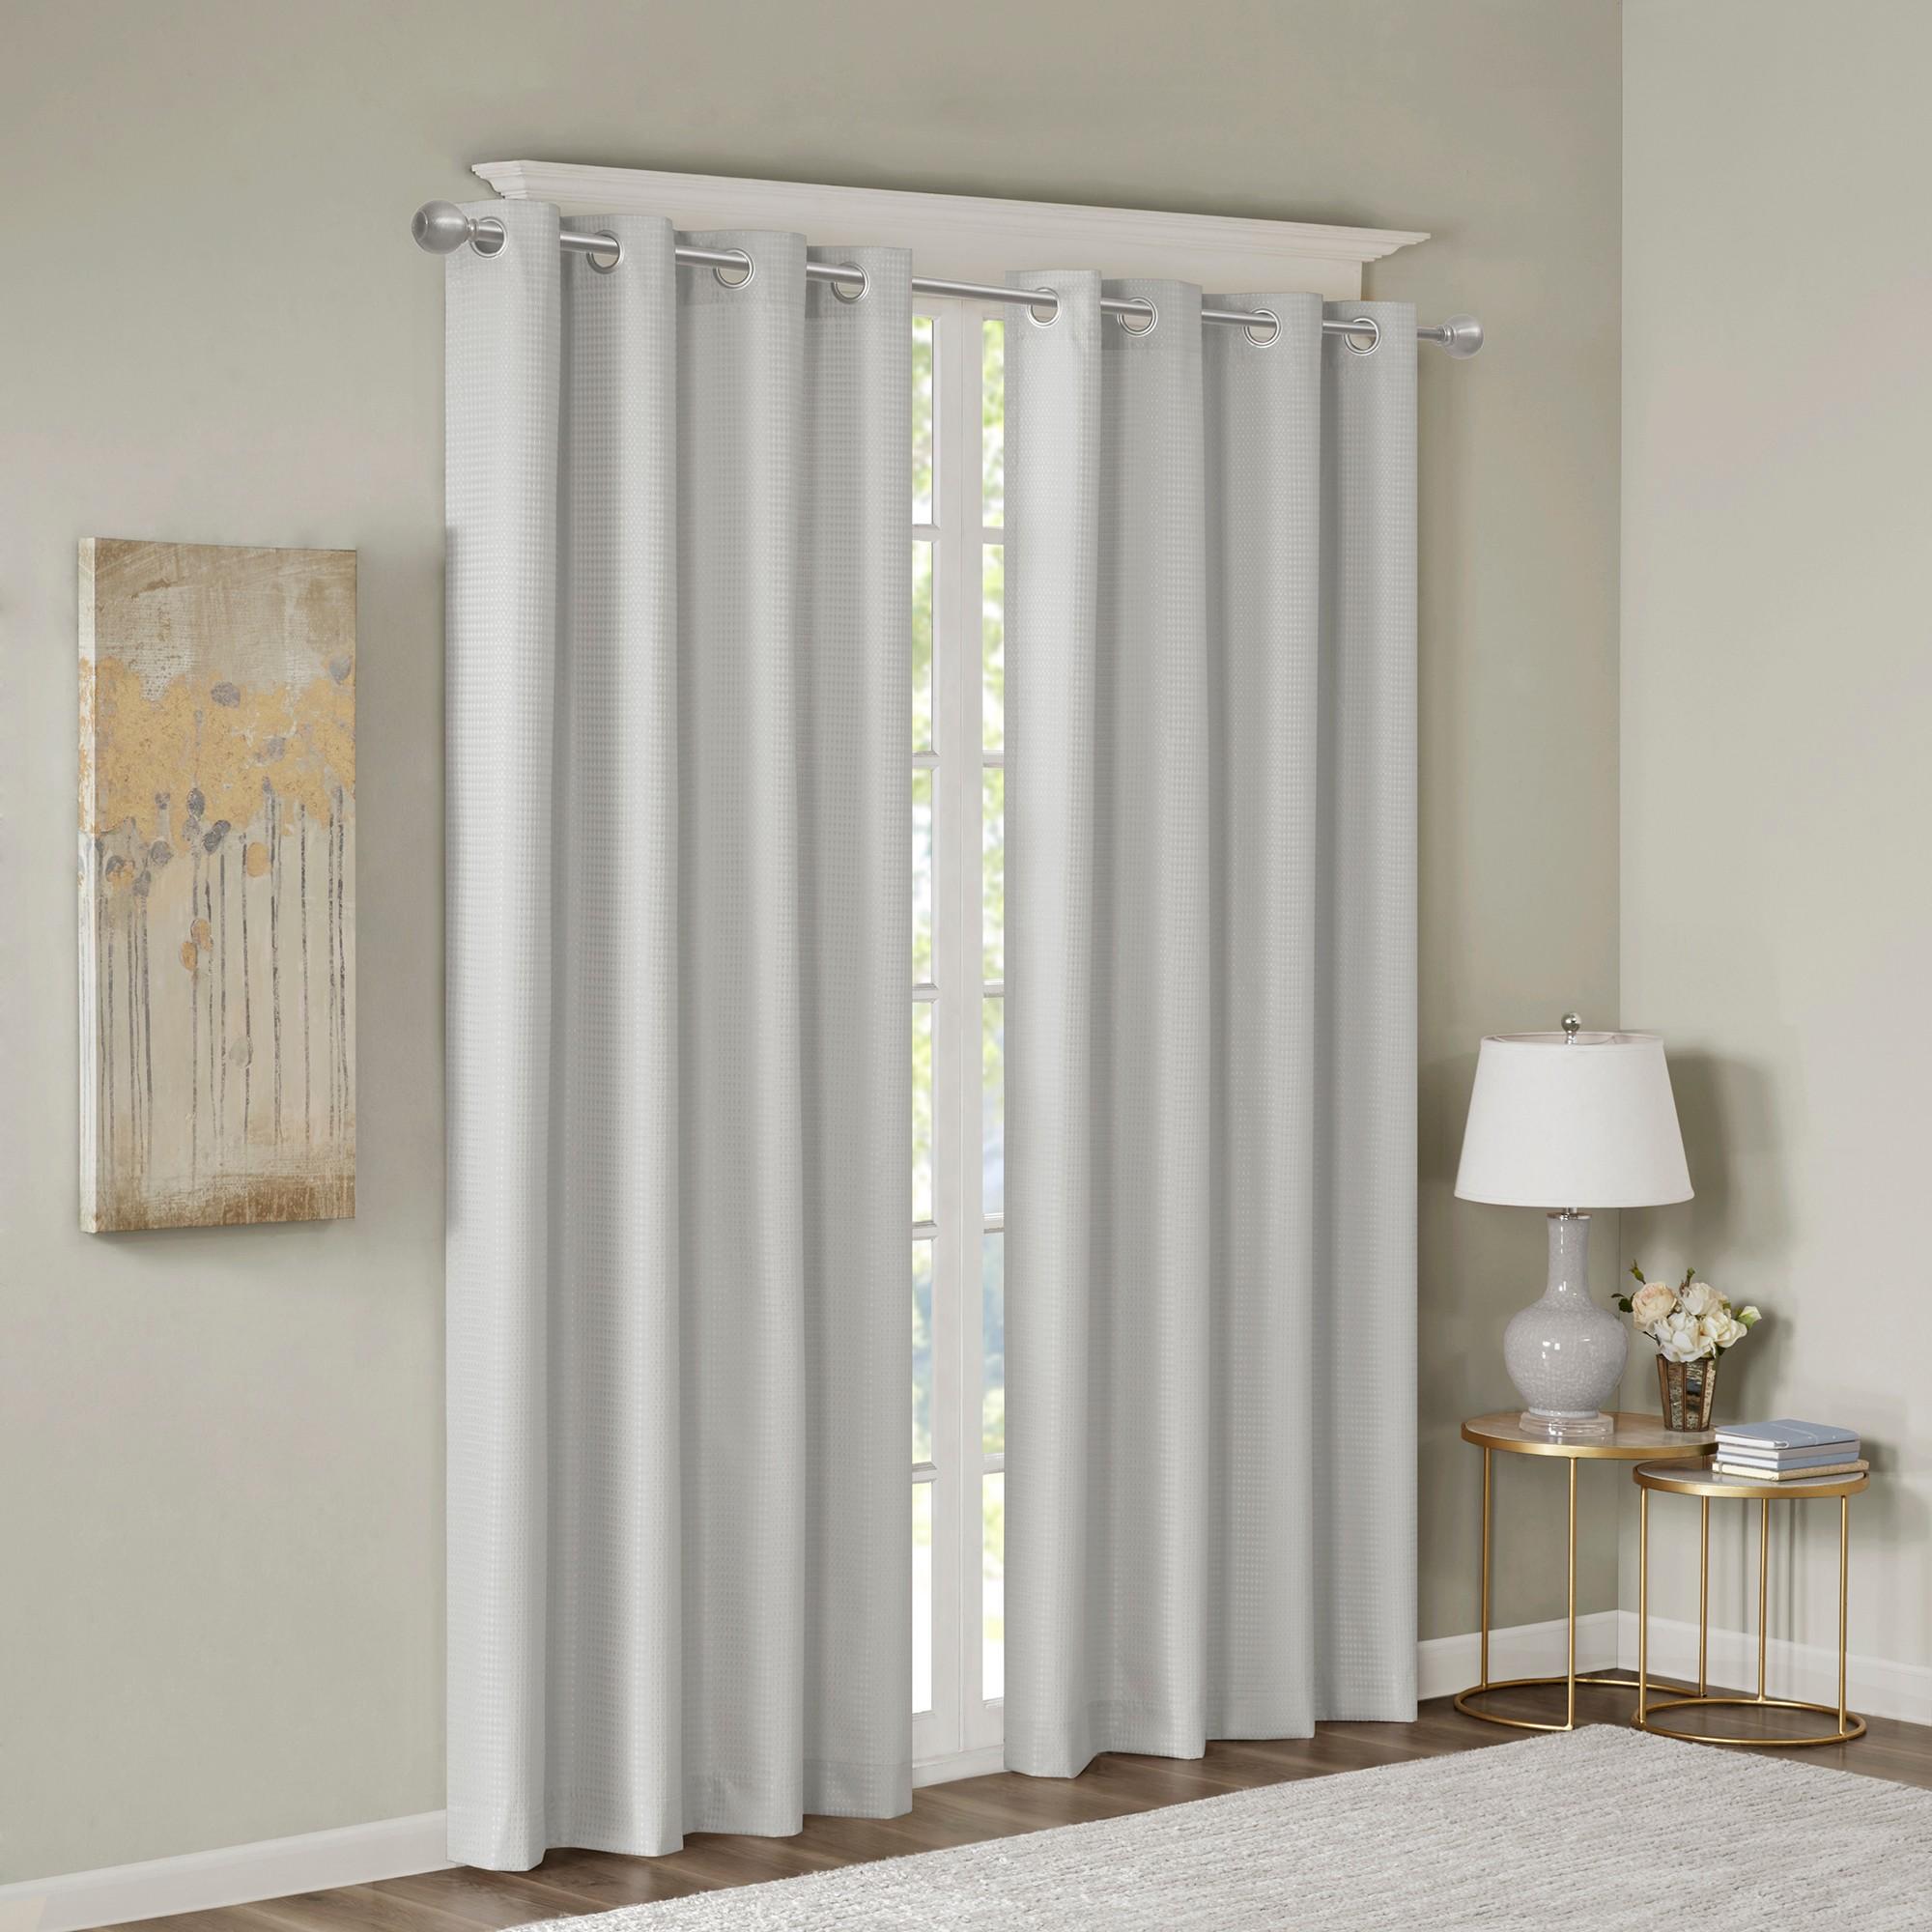 Lexie Jacquard Solid Room Darkening Panel Gray 50x95